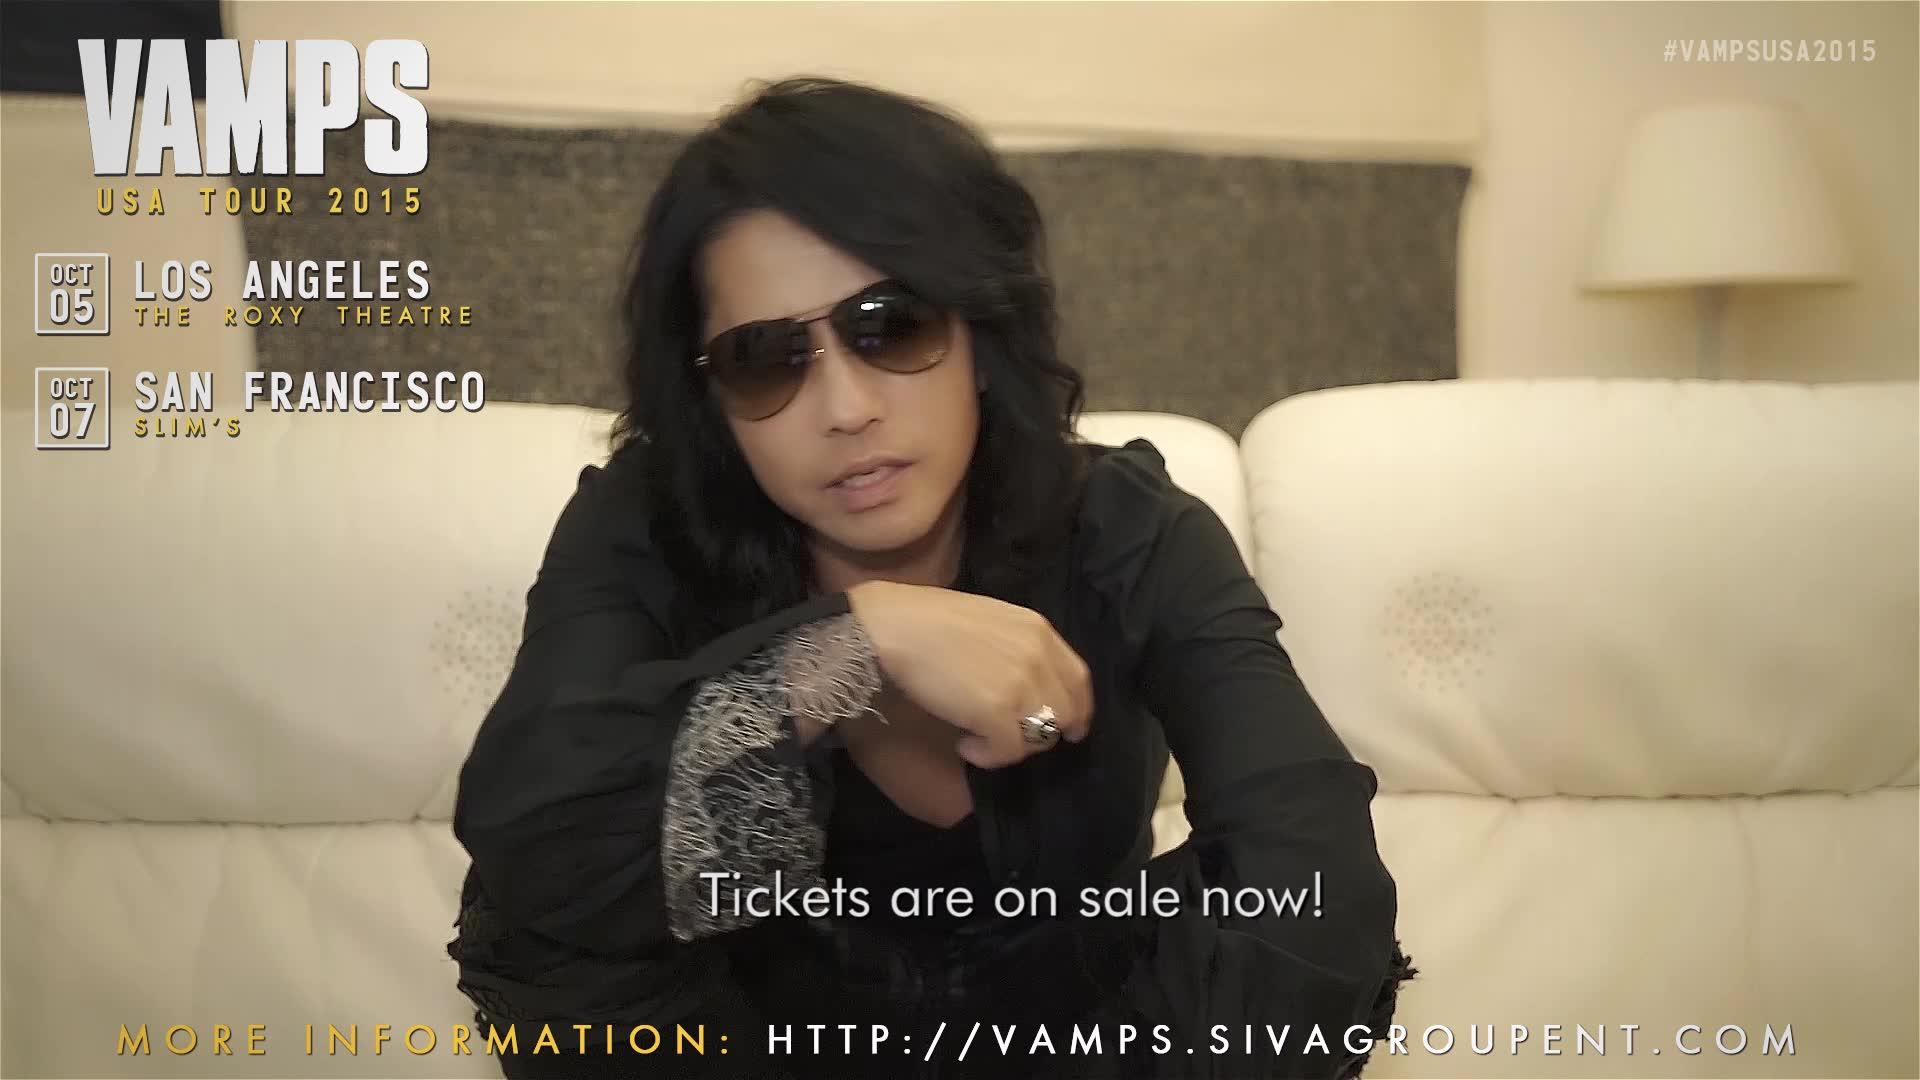 HYDE VAMPS Shoutout: VAMPS USA Tour 2015